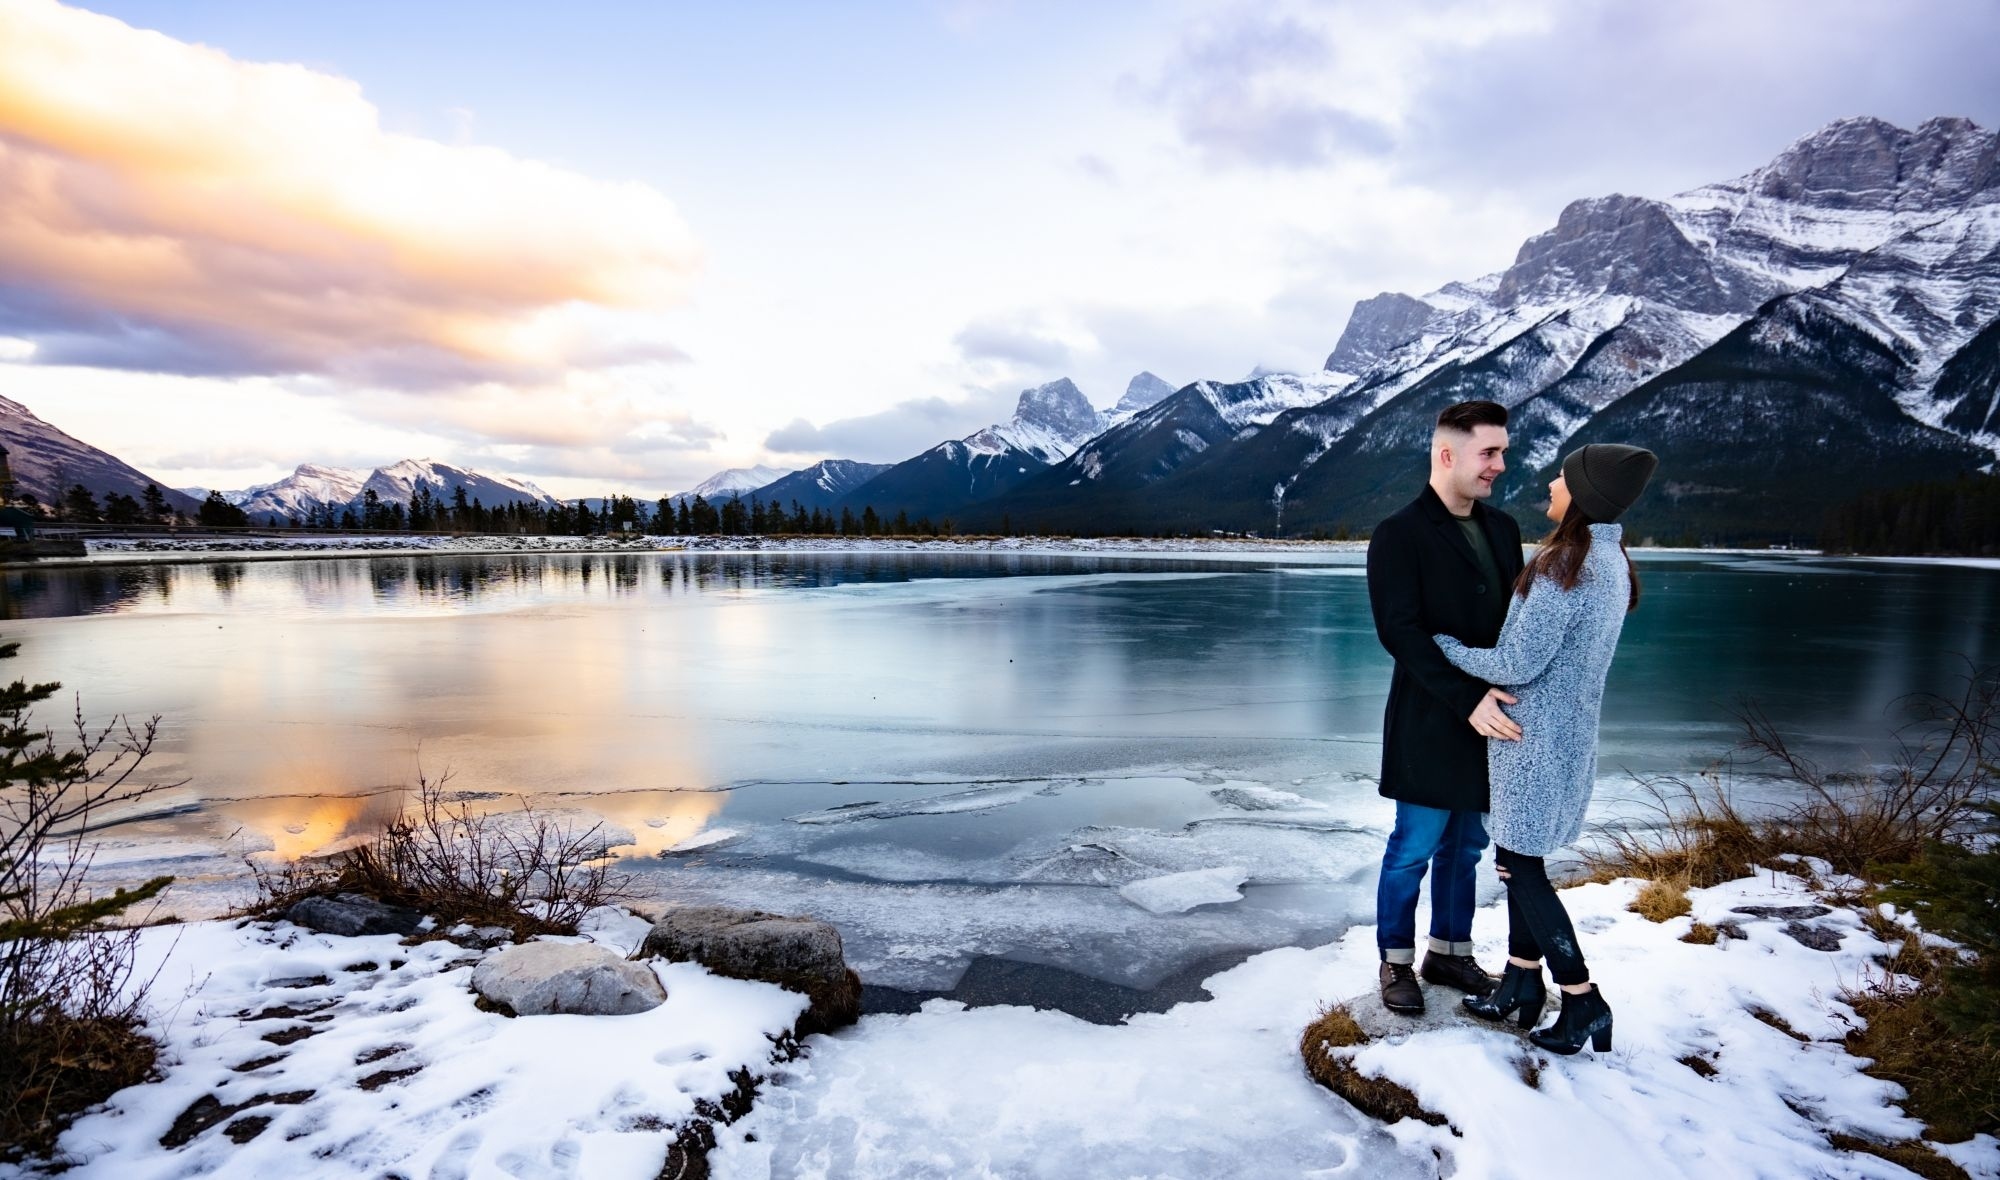 NKoz Photography Wedding & Engagement Photography Cover Image